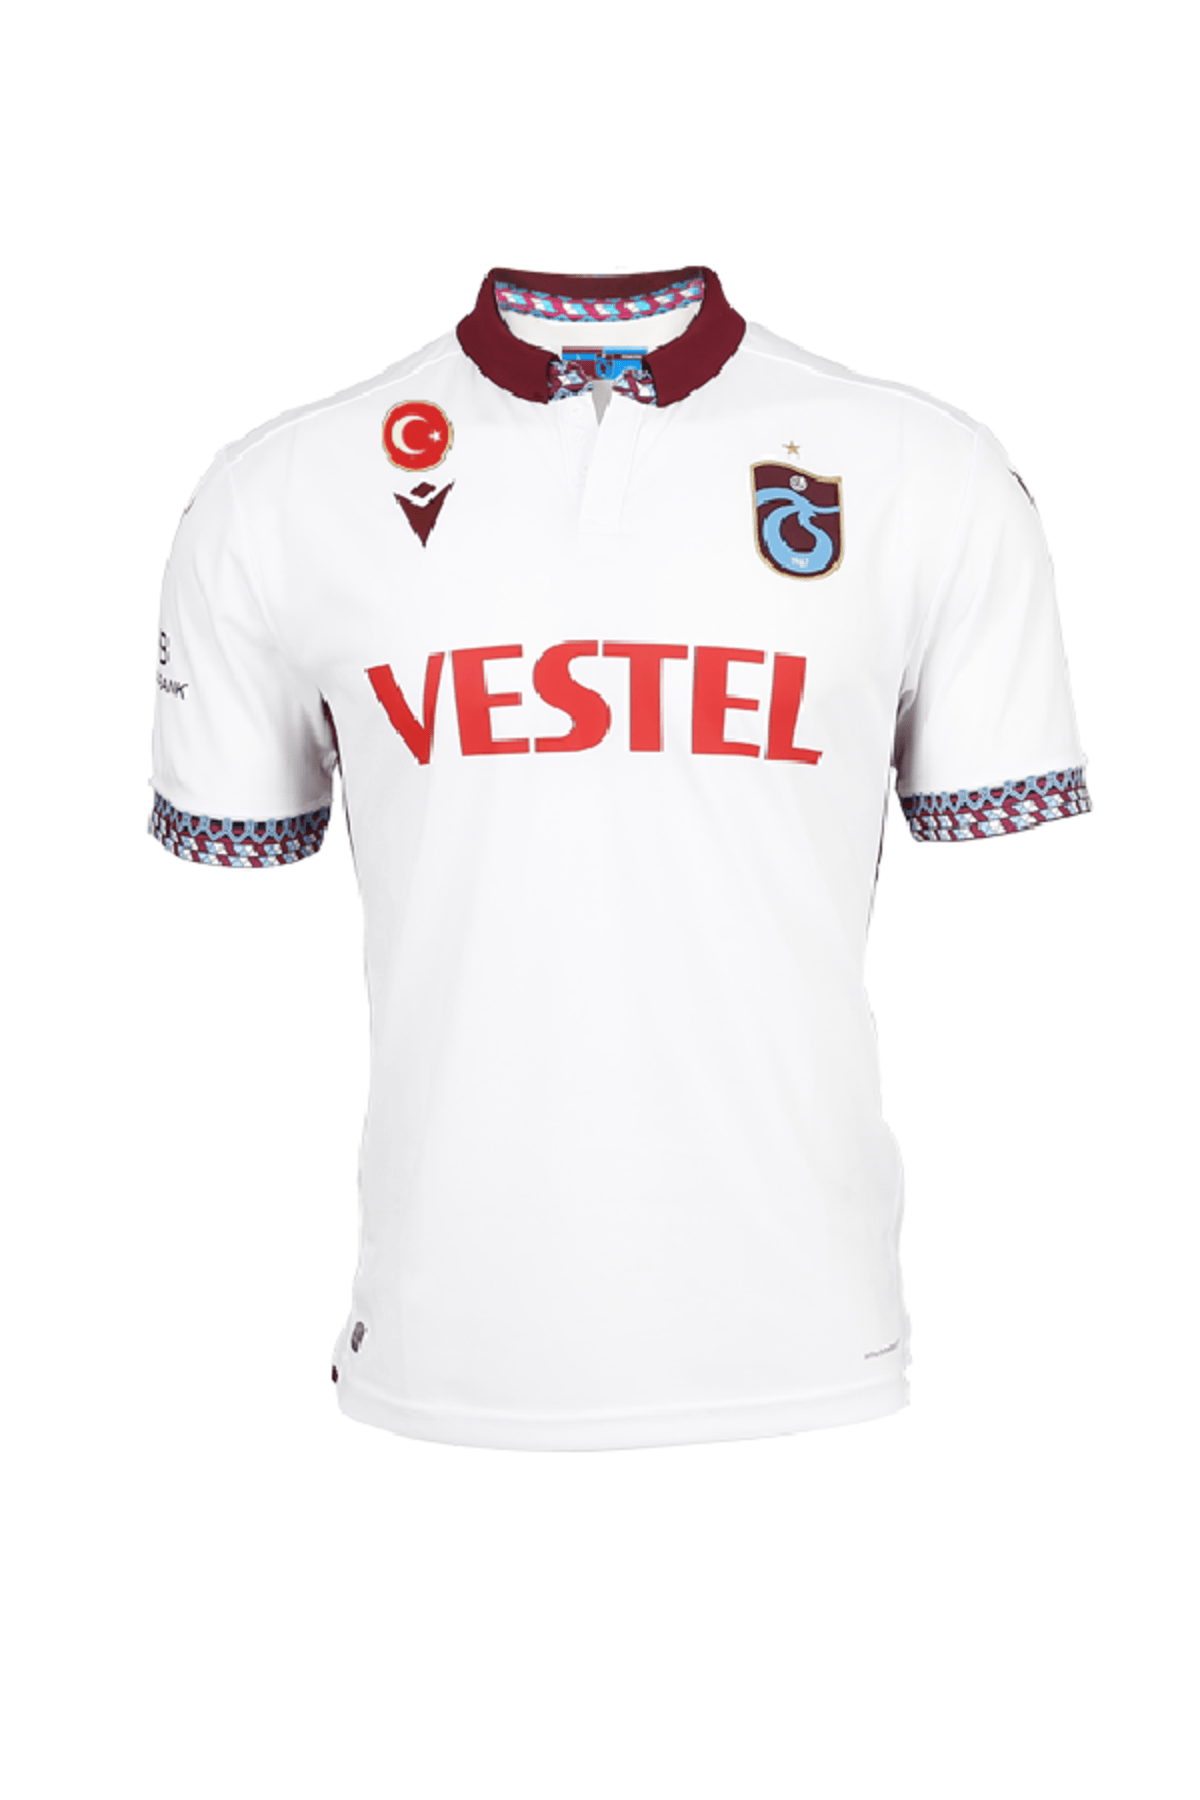 TSCLUB Trabzonspor Beyaz Yeni Sezon Forma TS-6286